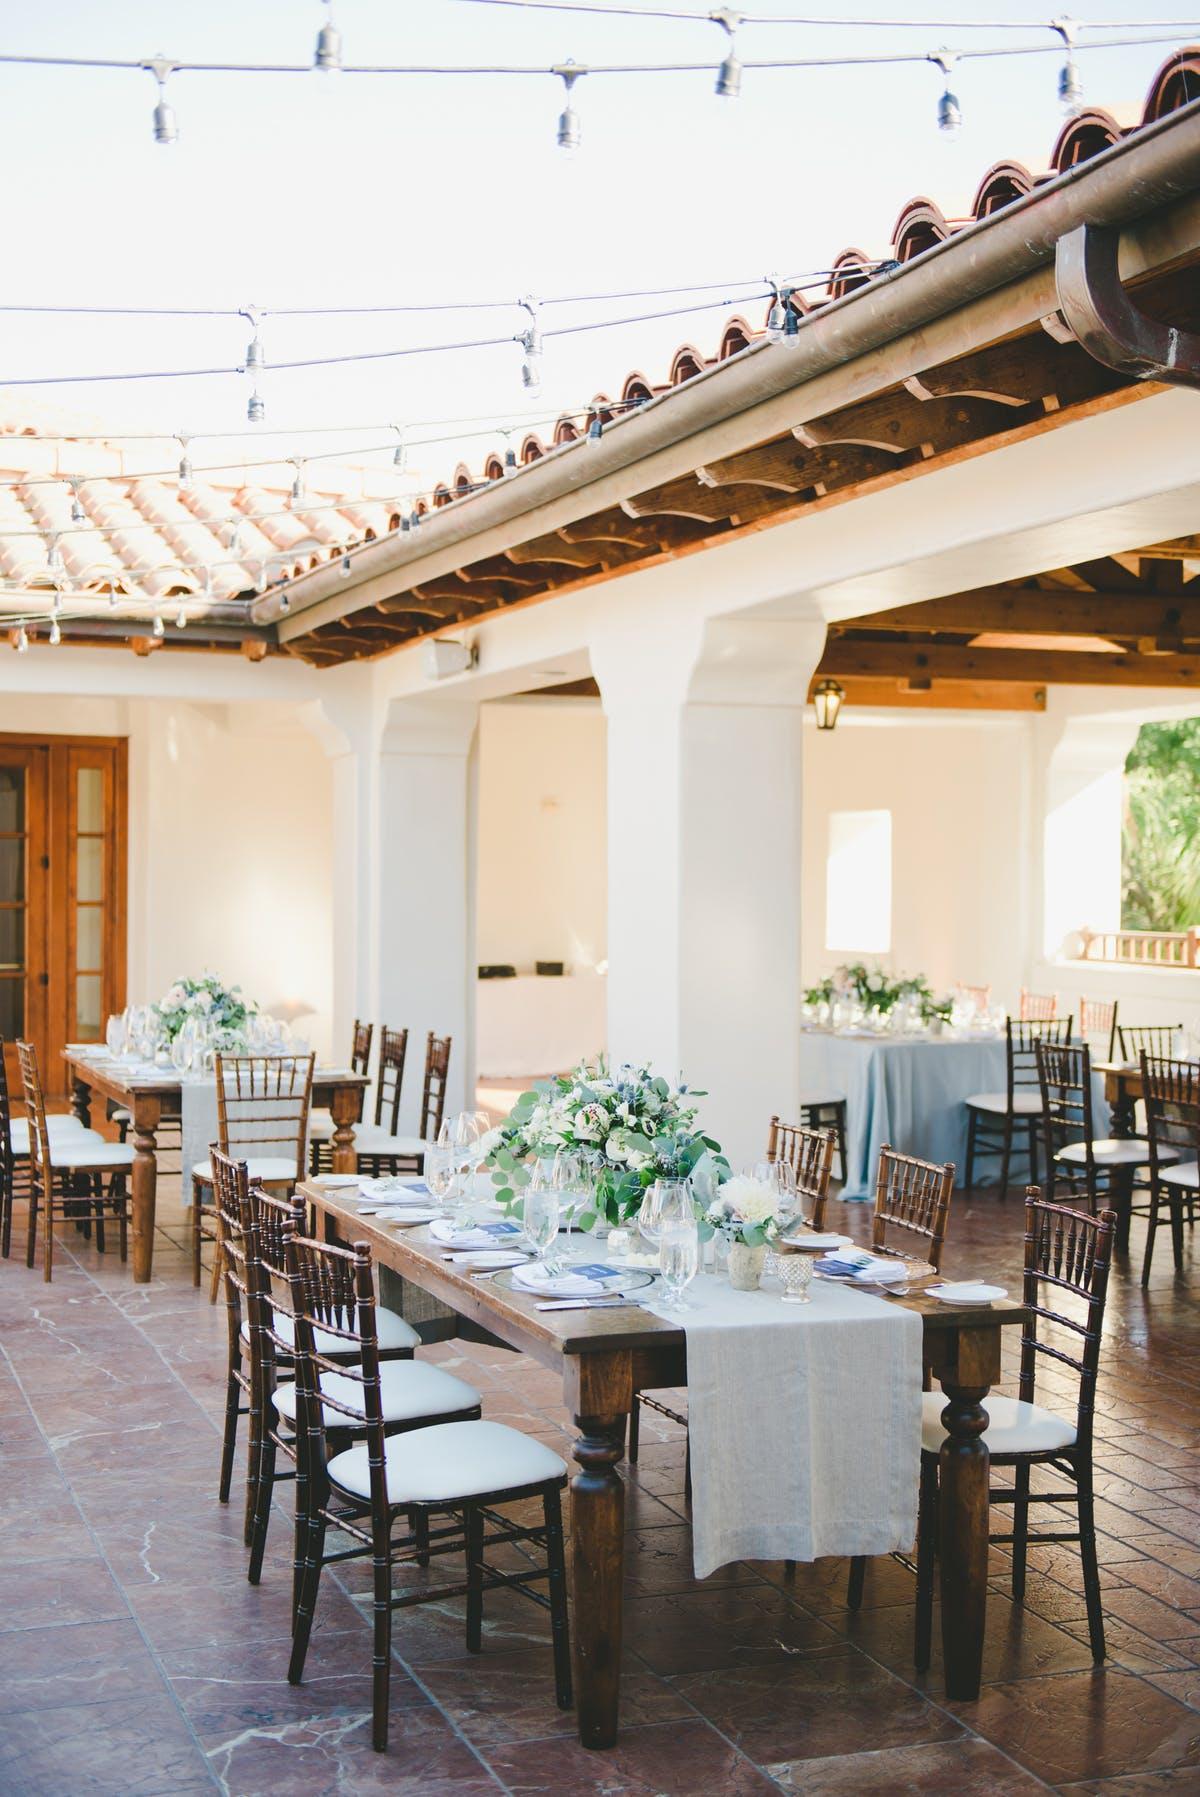 www.santabarbarawedding.com | Bacara Resort & Spa | Alegria By Design | onelove photography | Reception Tables